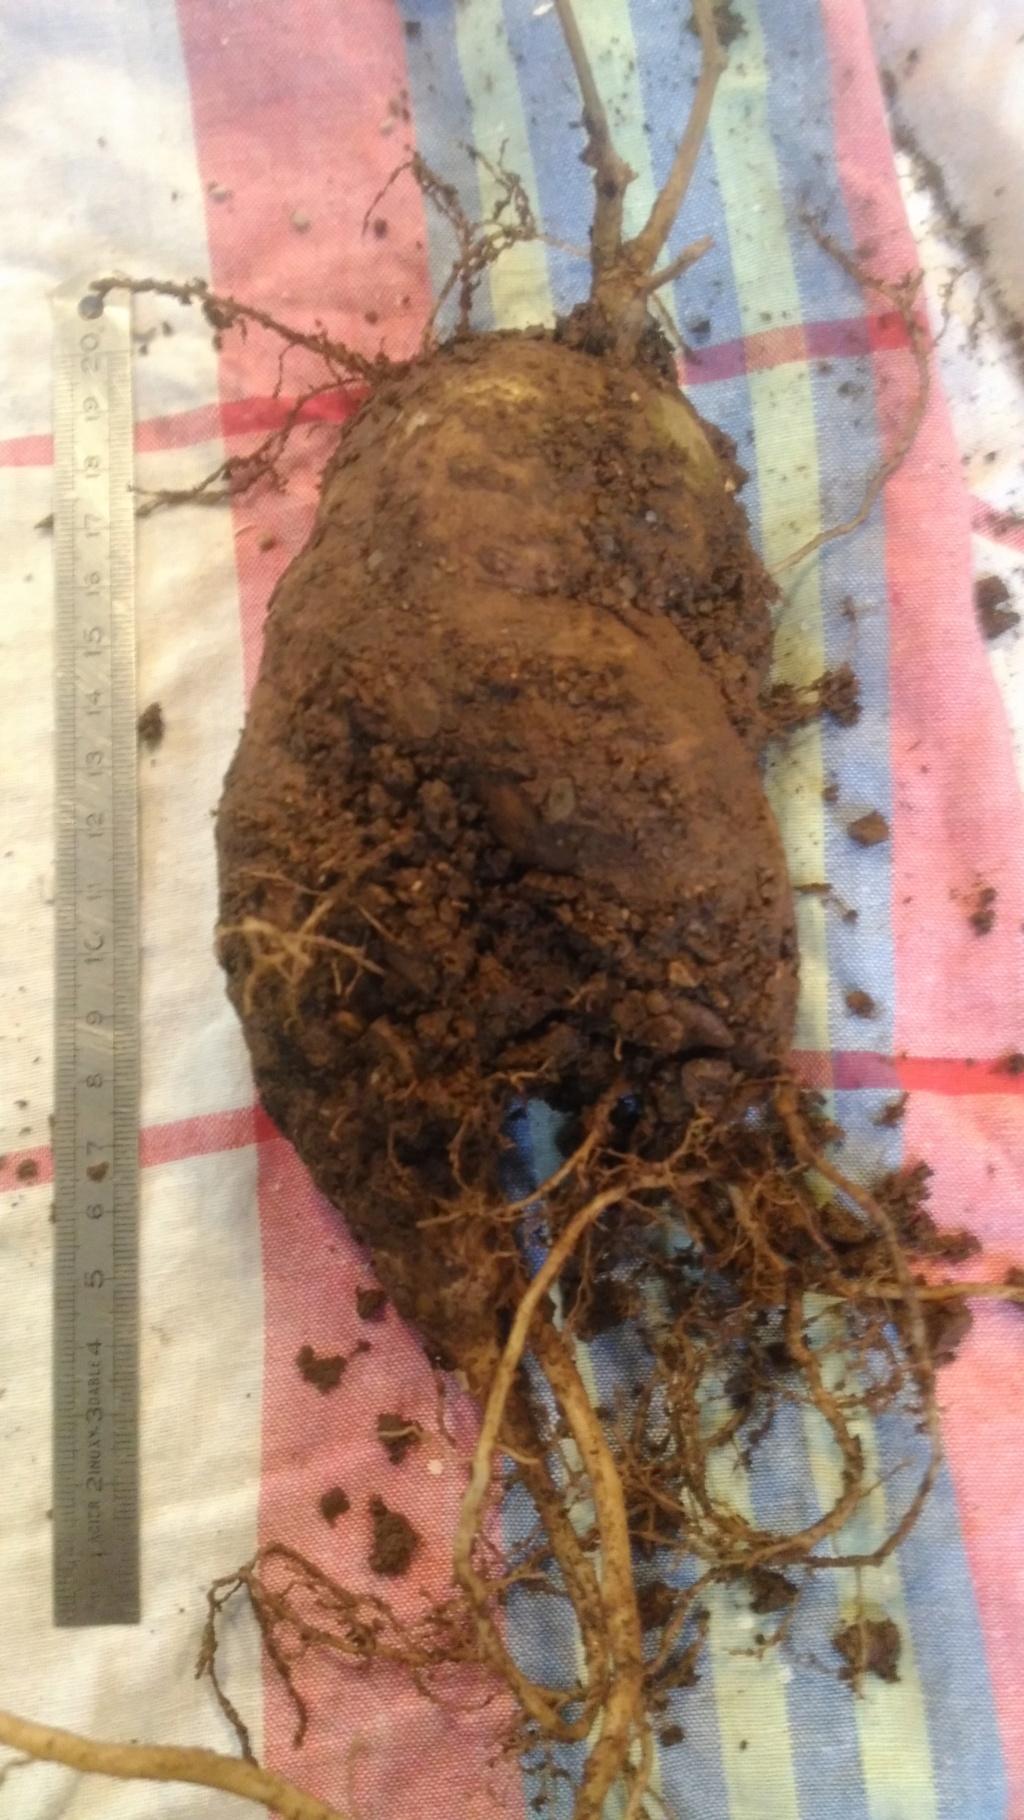 Mes semis : Gerrardanthus macrorhizus, Kedrostis africana, Ibervillea tenuisecta... - Page 2 P_201816